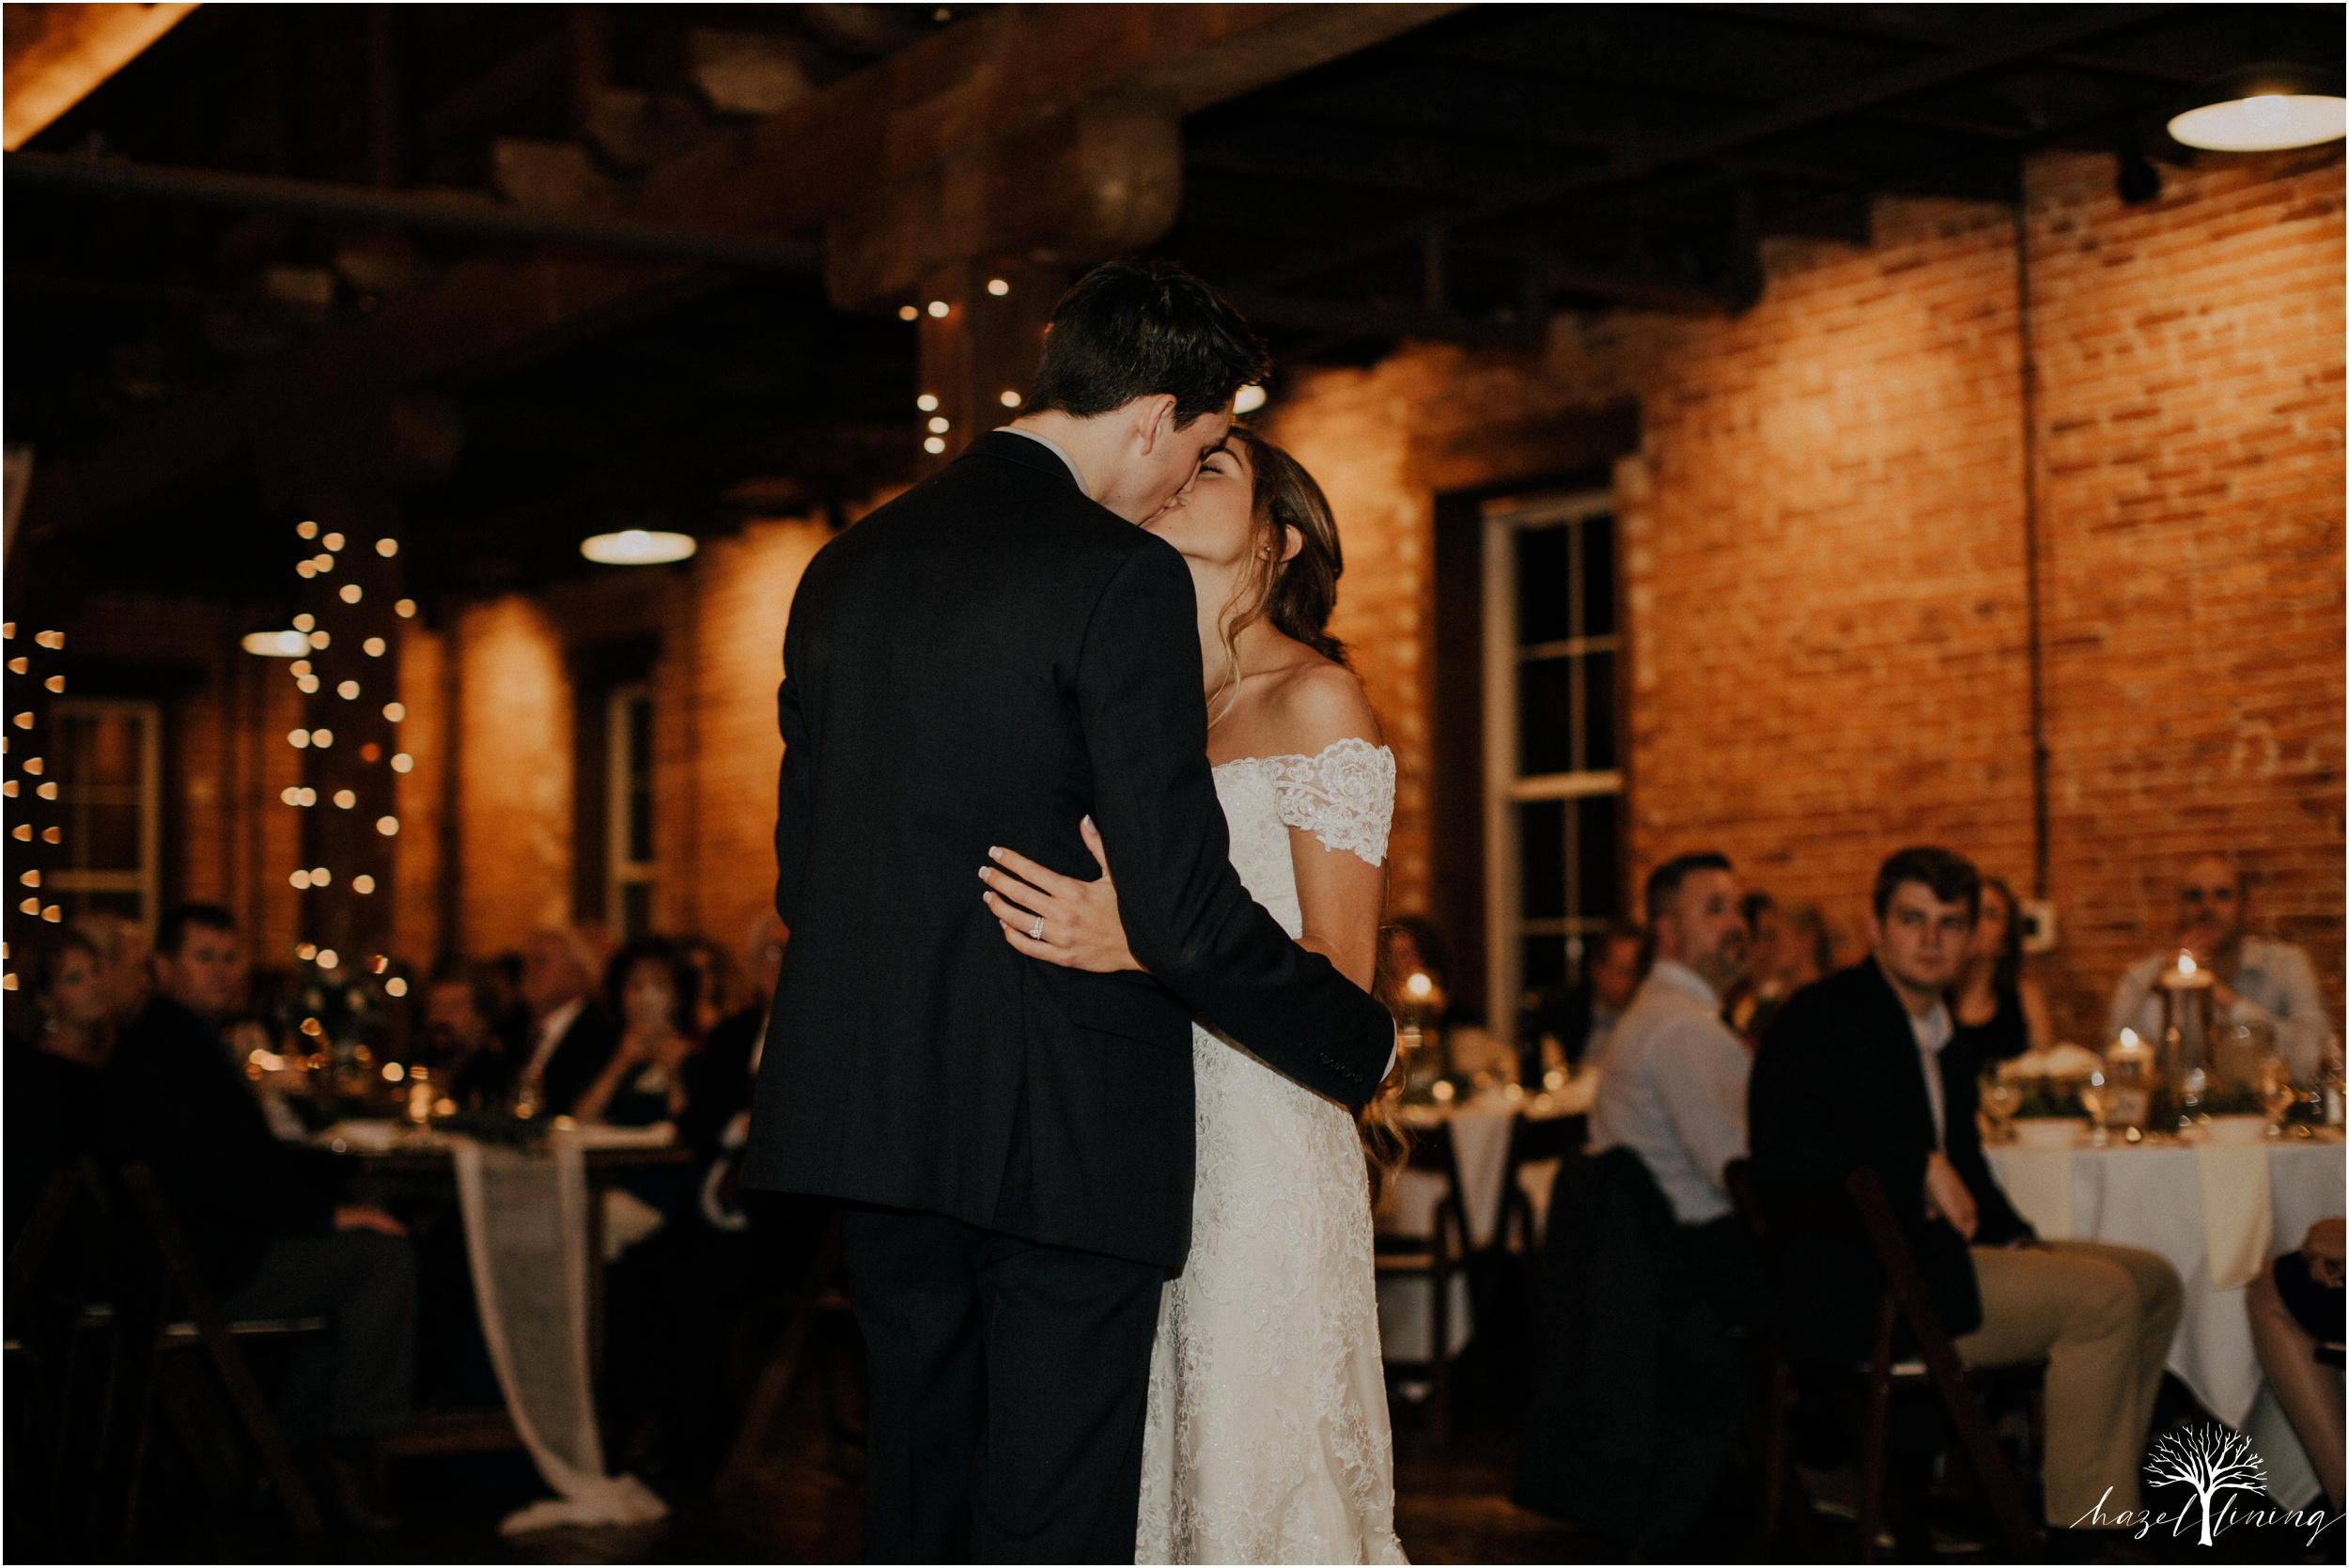 emma-matt-gehringer-the-booking-house-lancaster-manhiem-pennsylvania-winter-wedding_0147.jpg